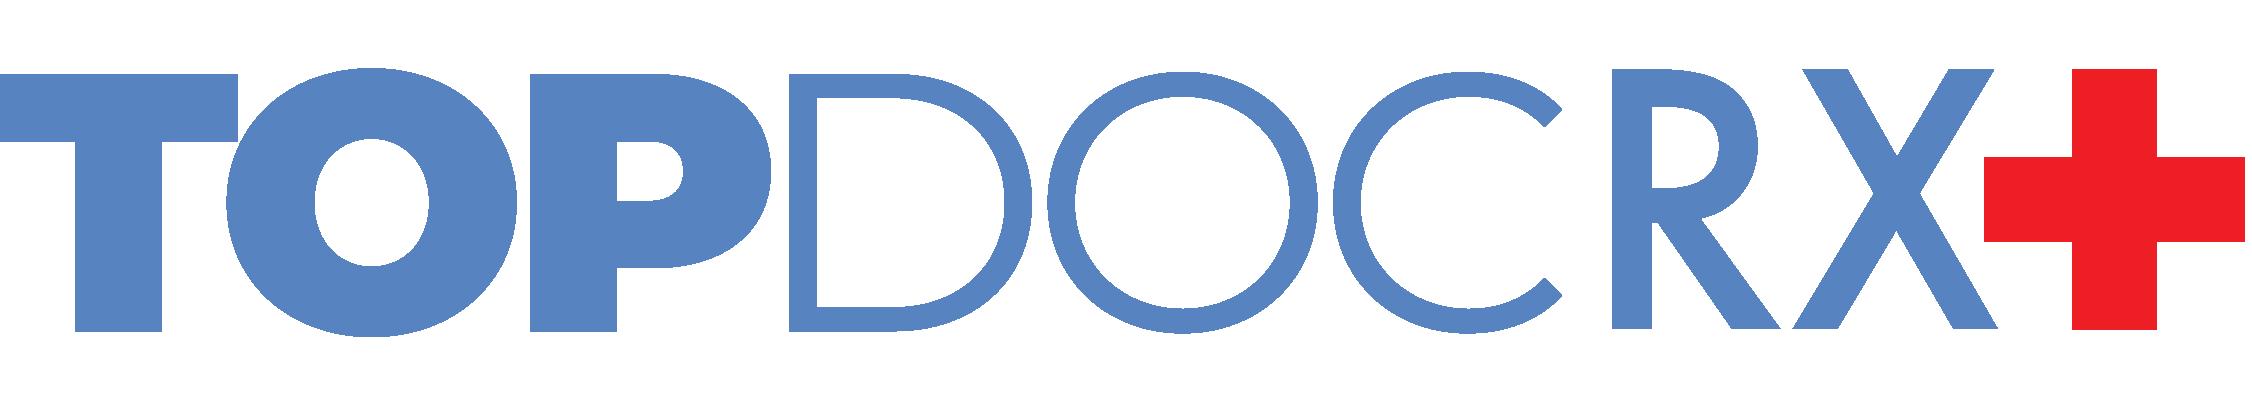 TOPDOCRX - logo image